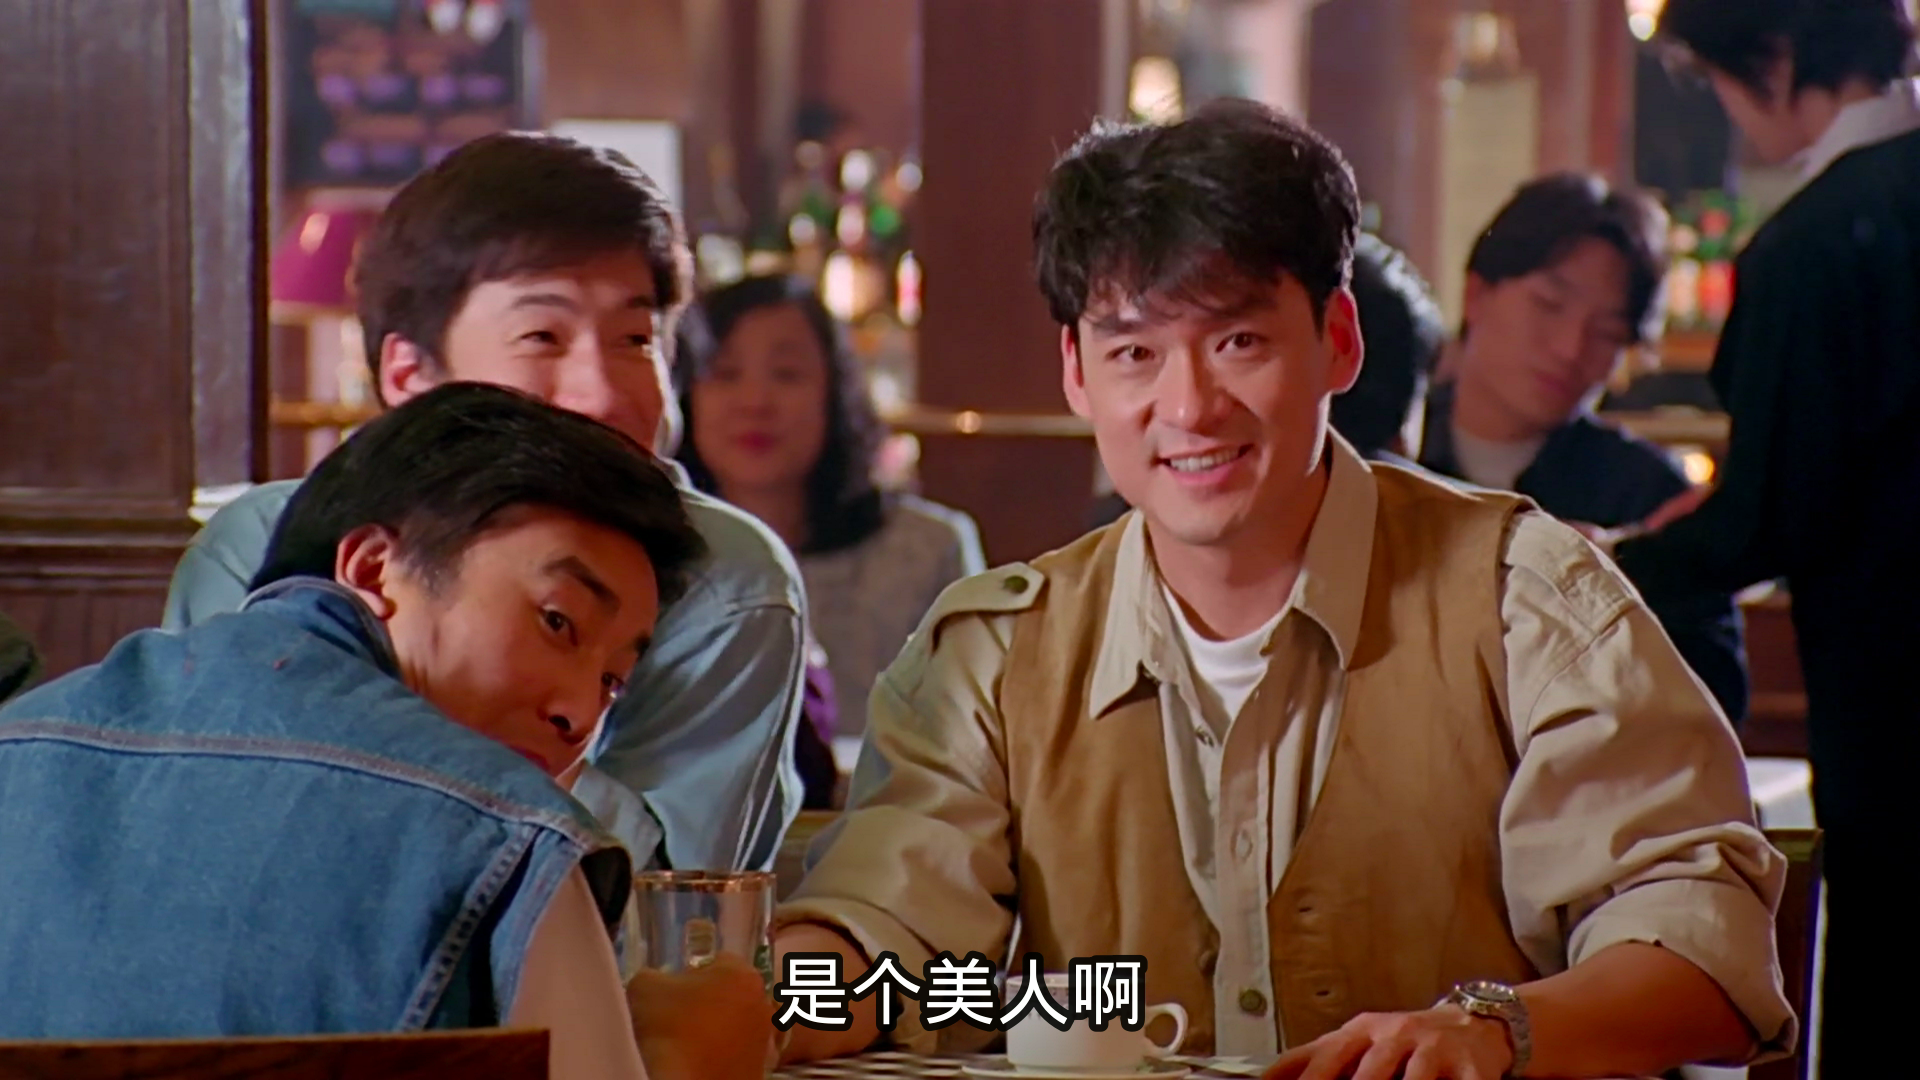 [MEGA]1997-97家有喜事-WEB-DL-1080p